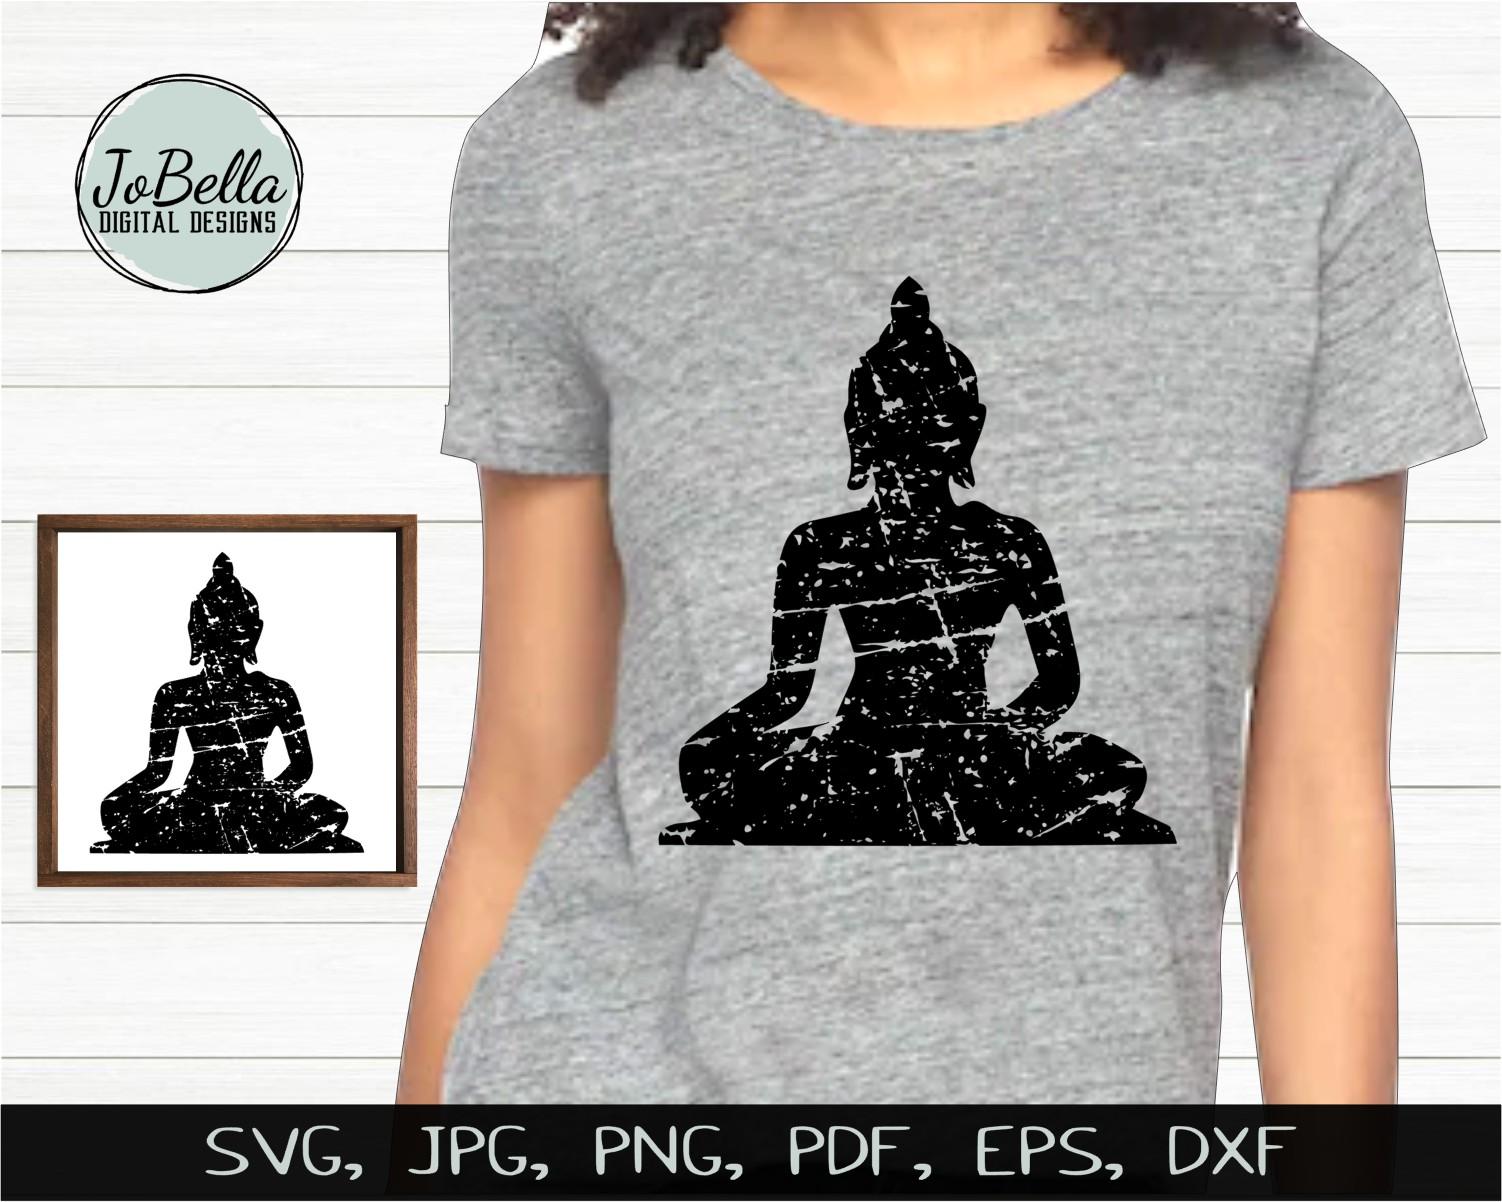 Boho SVG Bundle, Sublimation PNGs & Printables example image 22